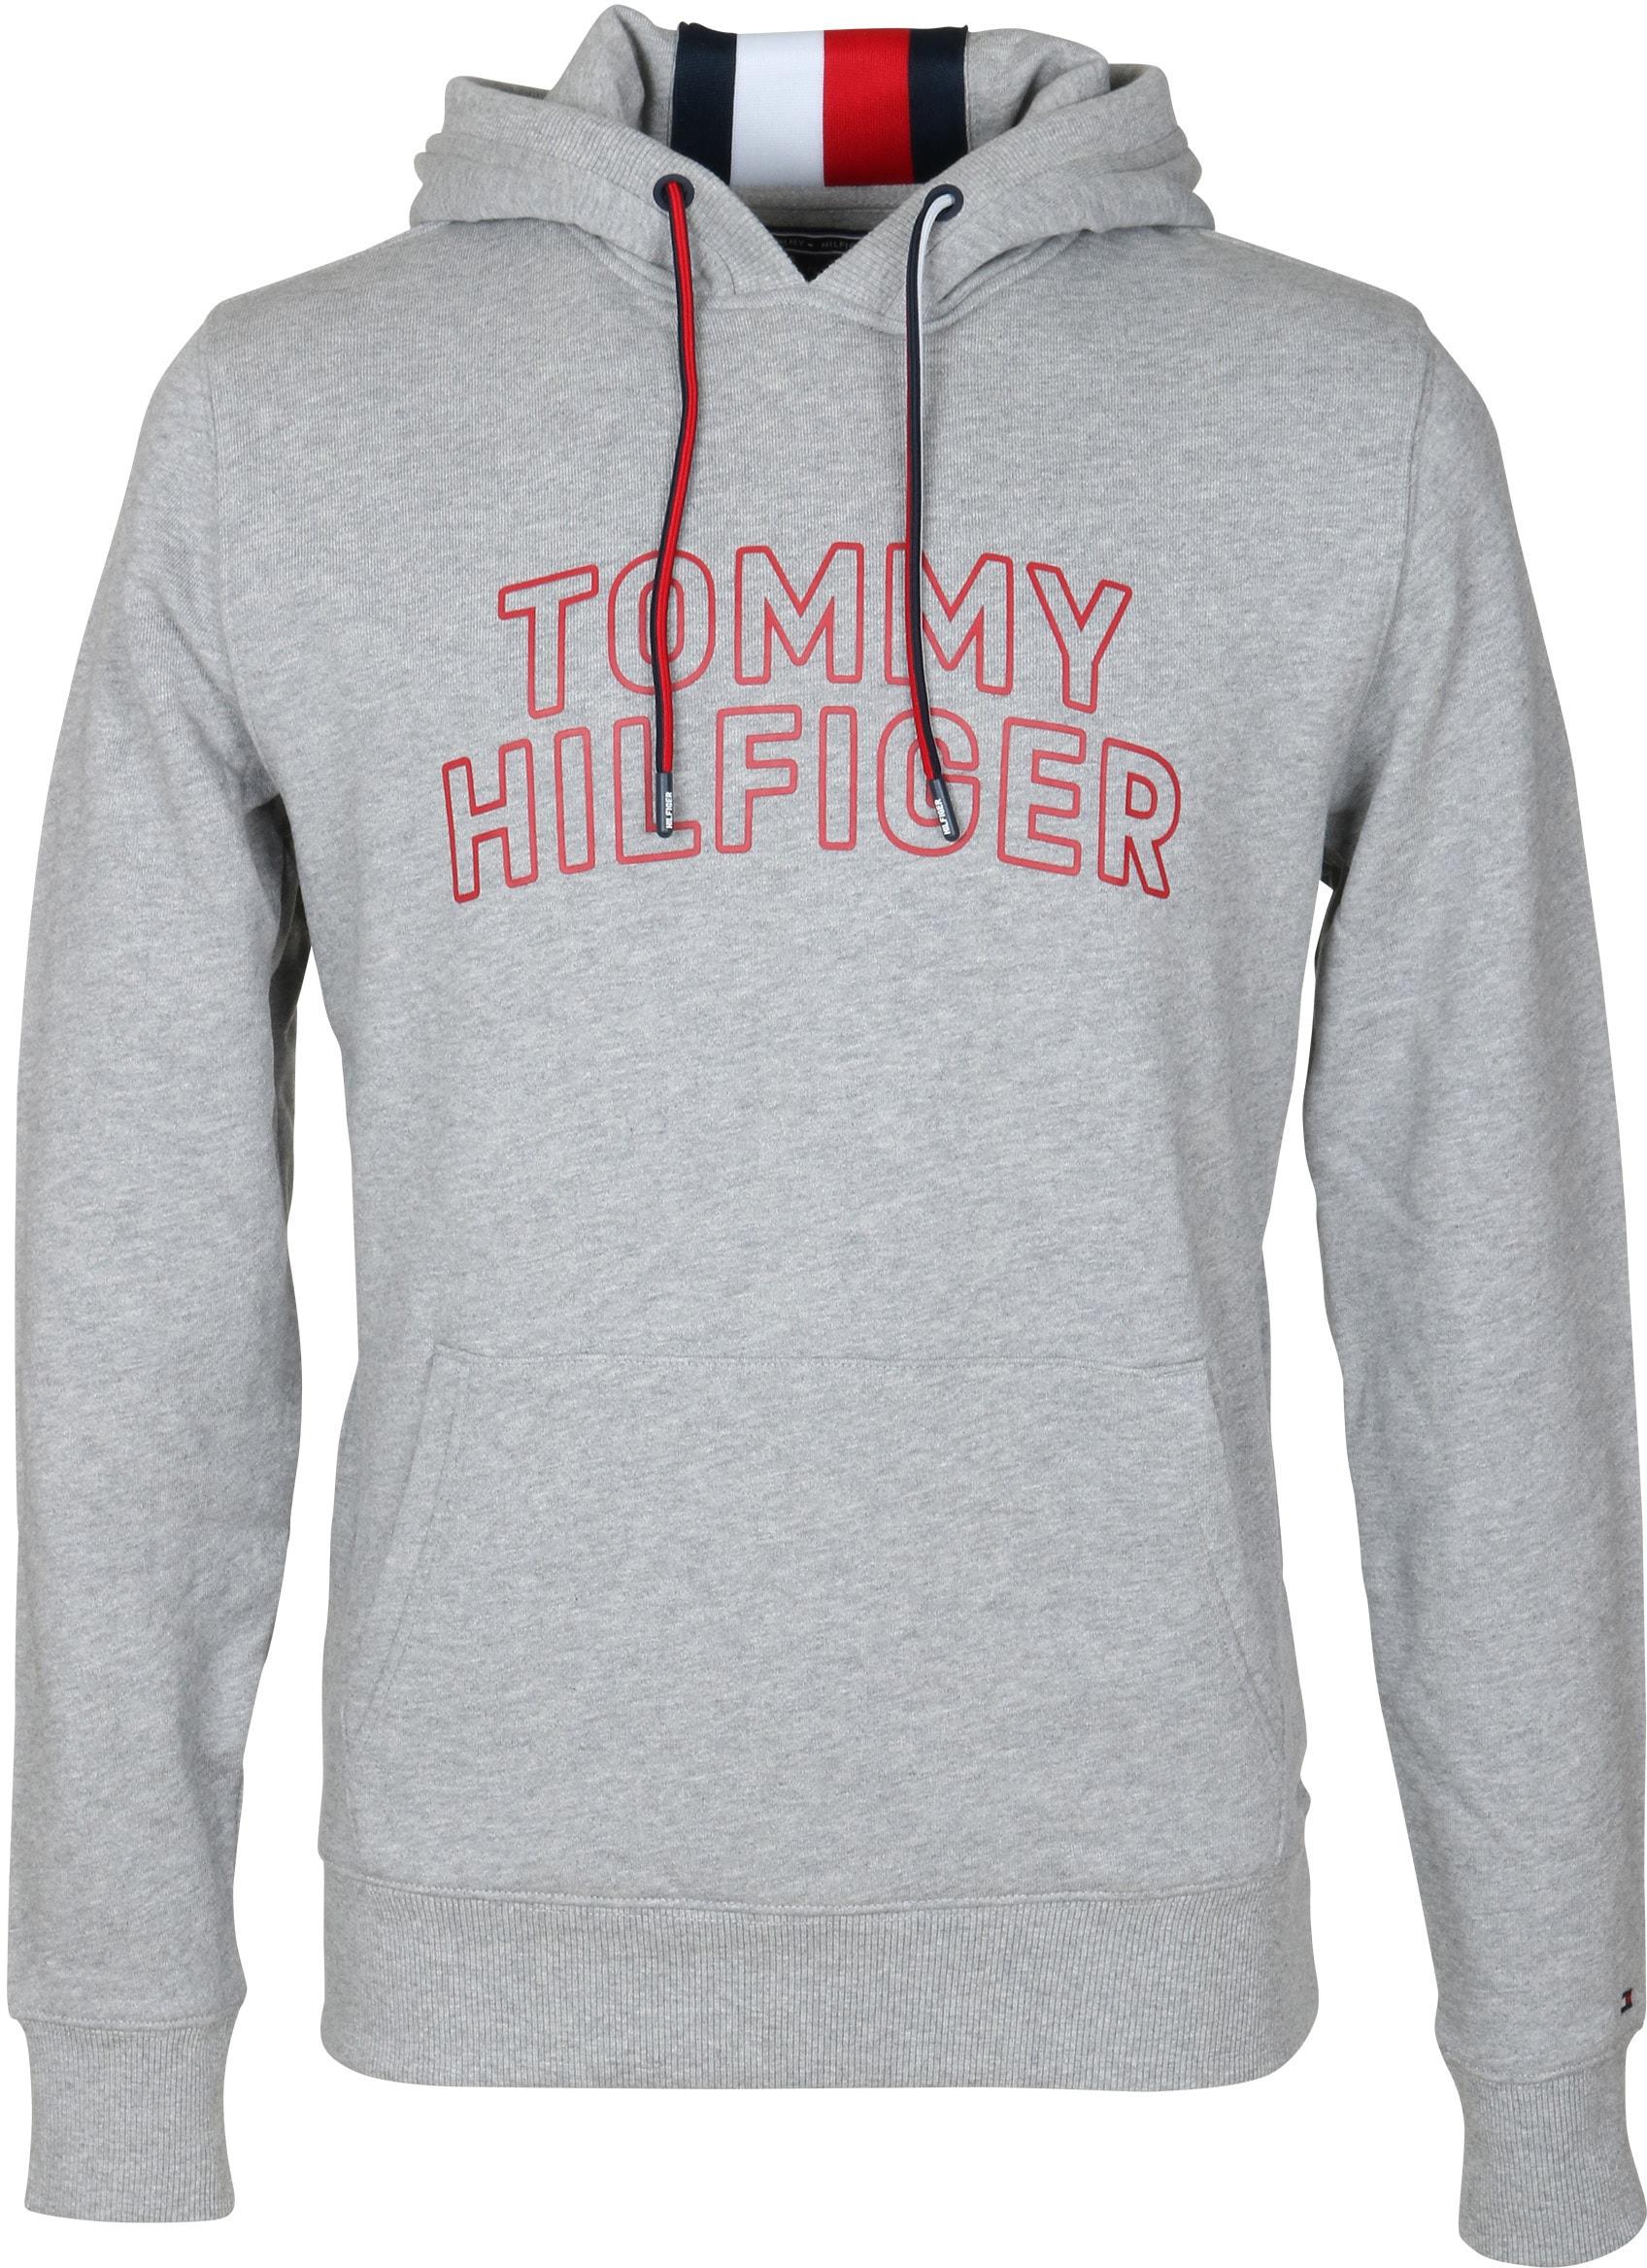 Tommy Hilfiger Hoodie Grijs foto 0